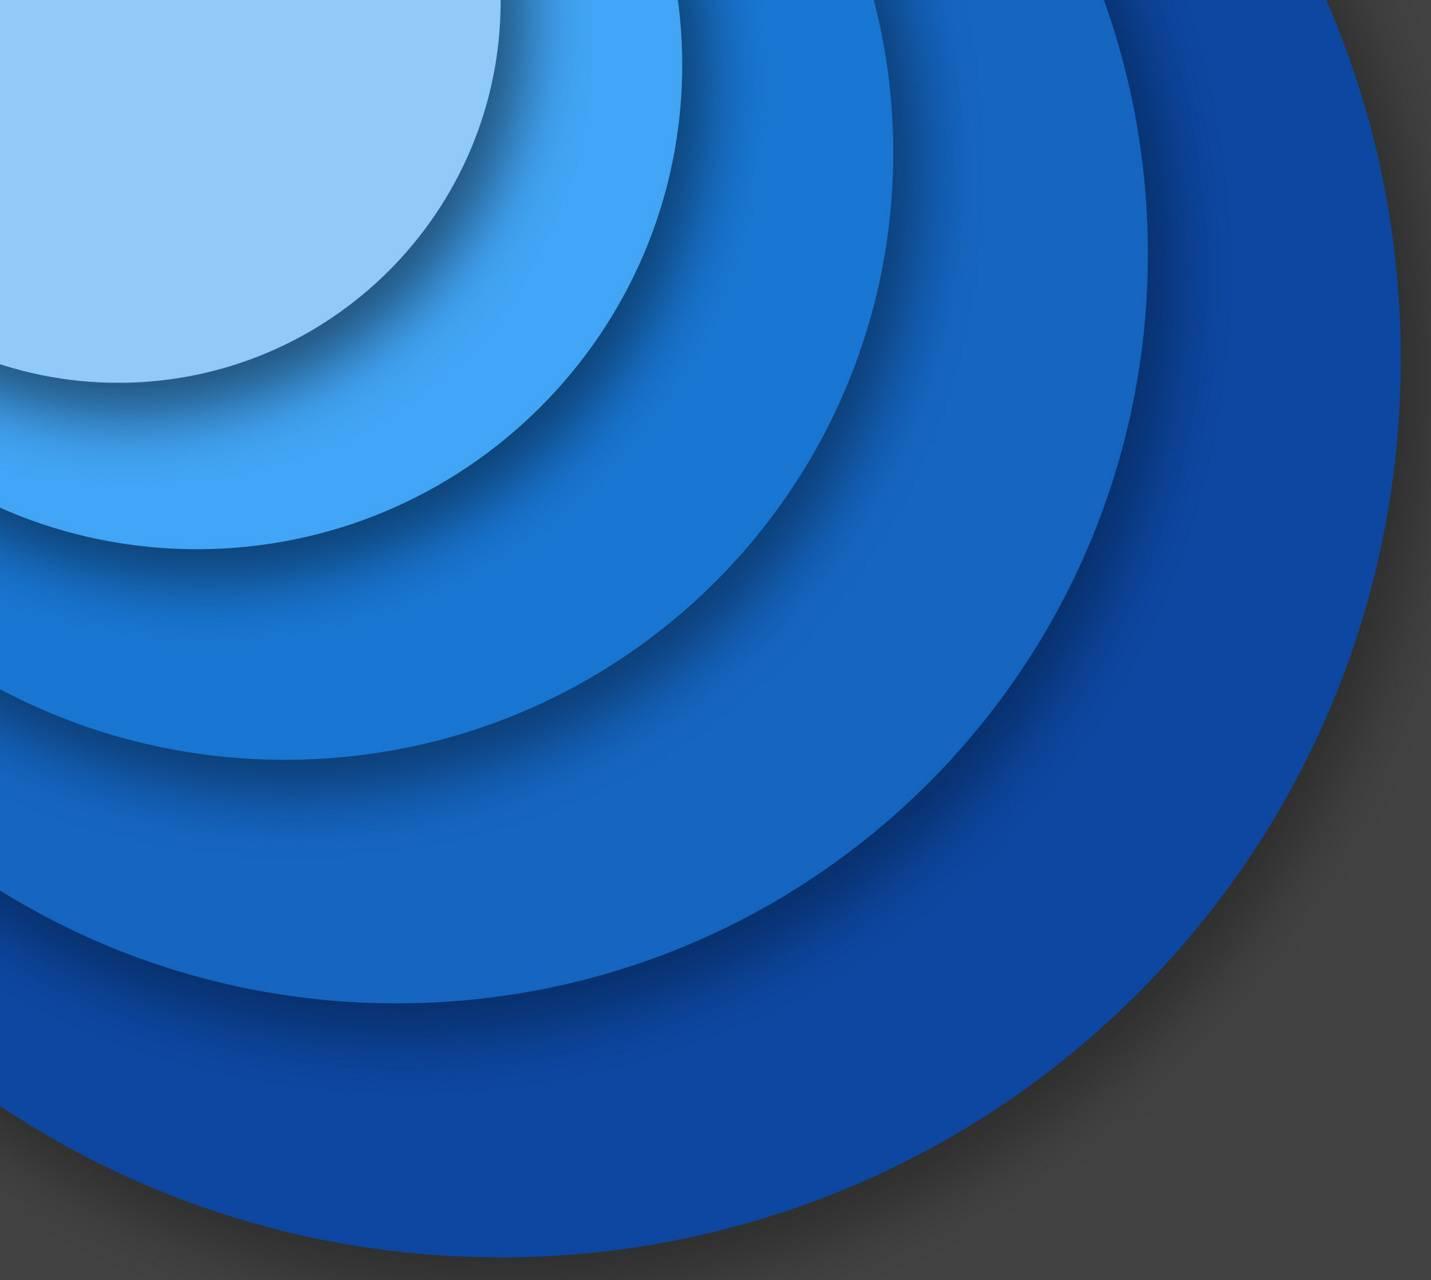 Blue Material Circle